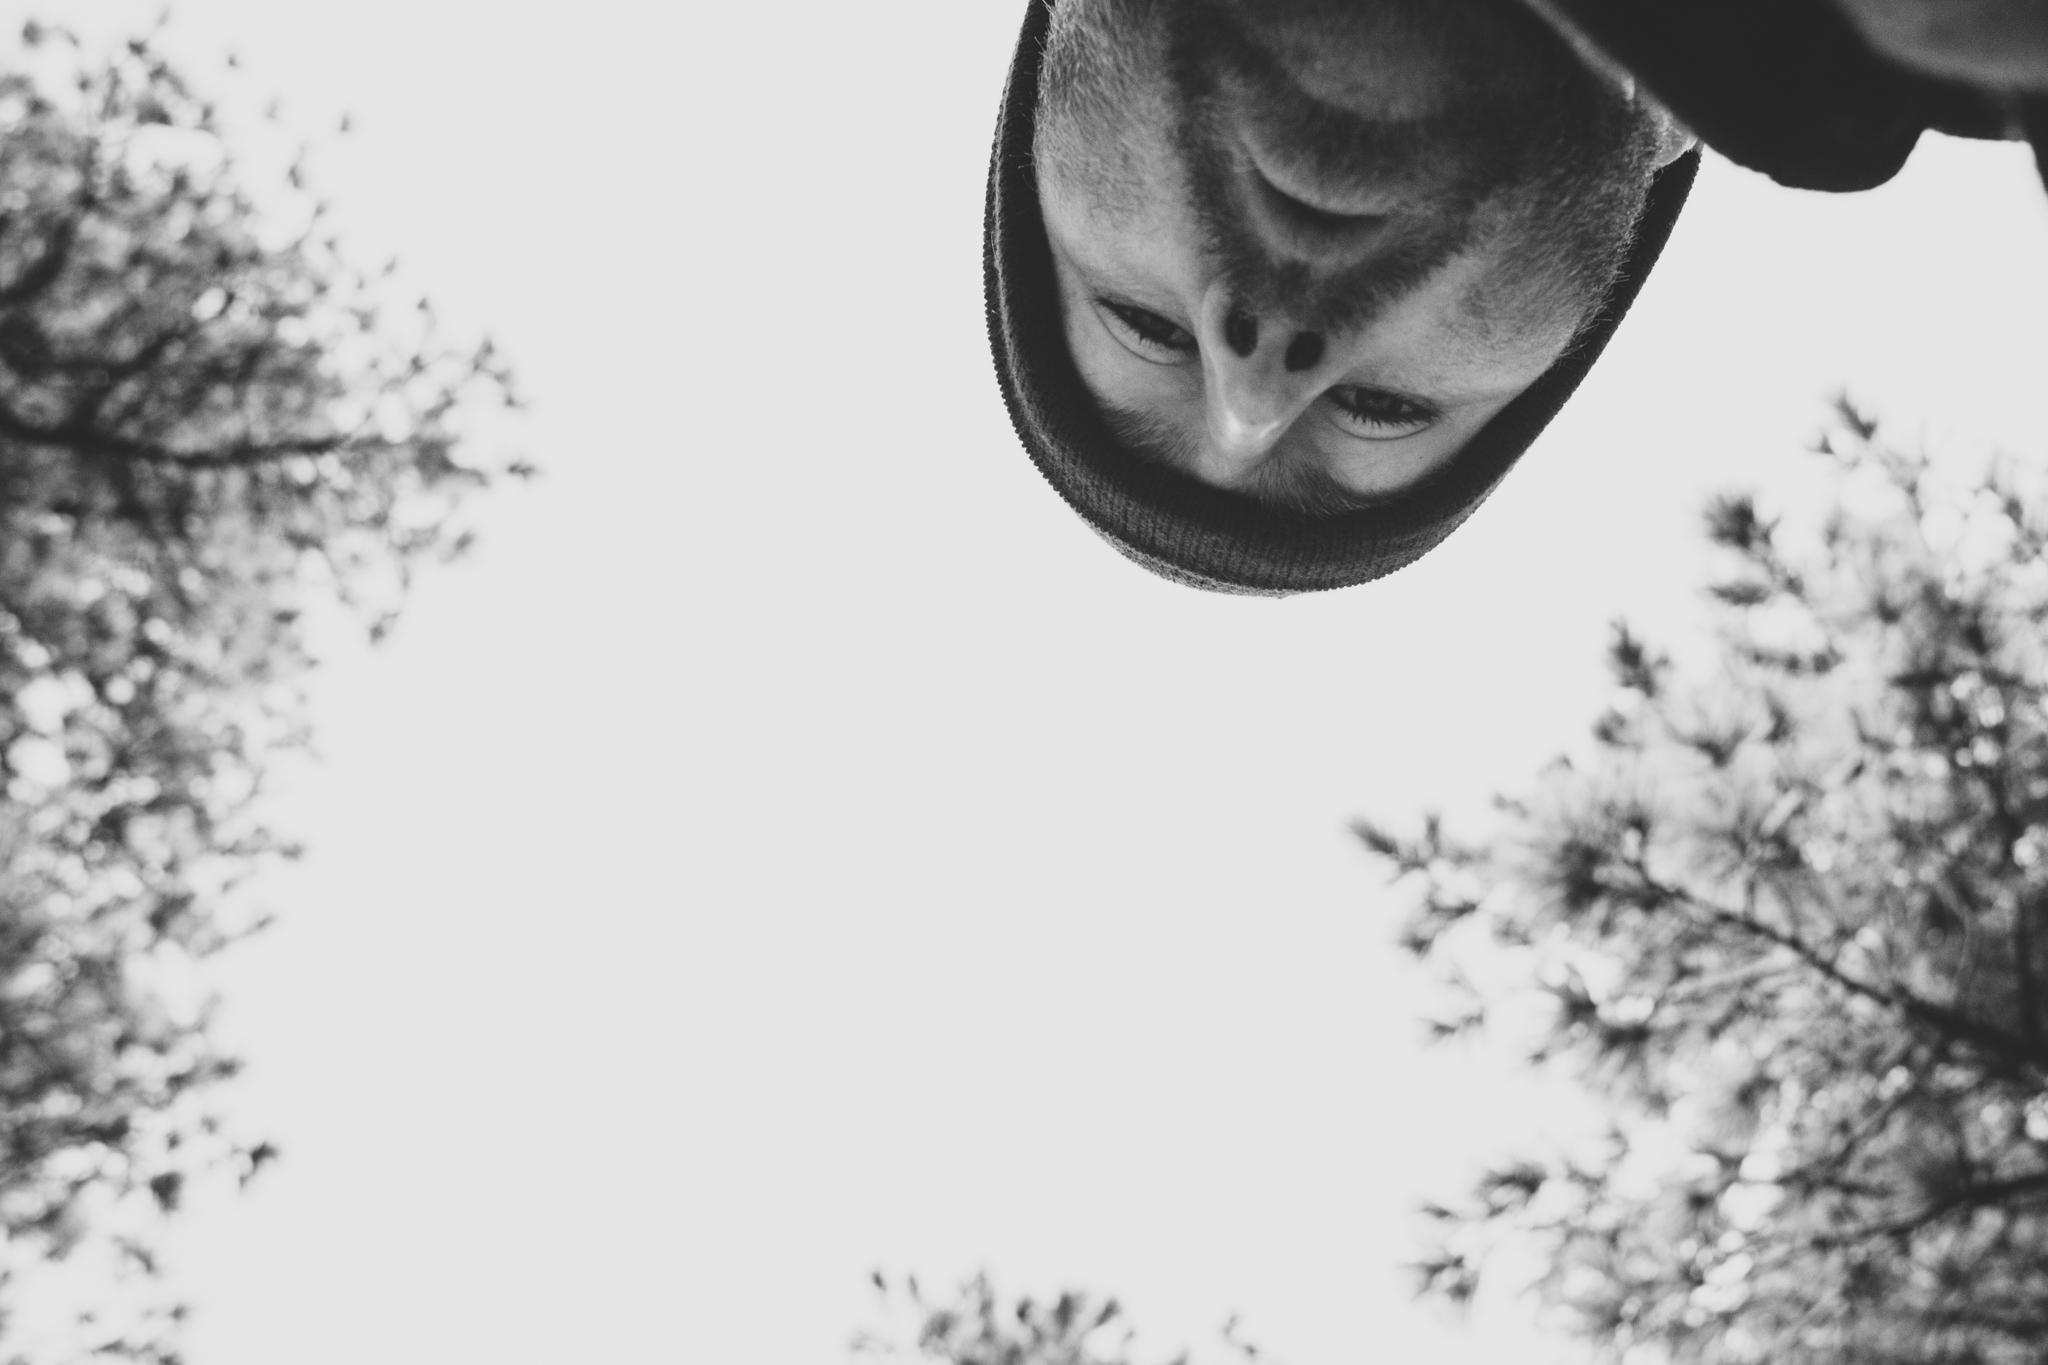 black and white selfie aaron kes flagstaff trees